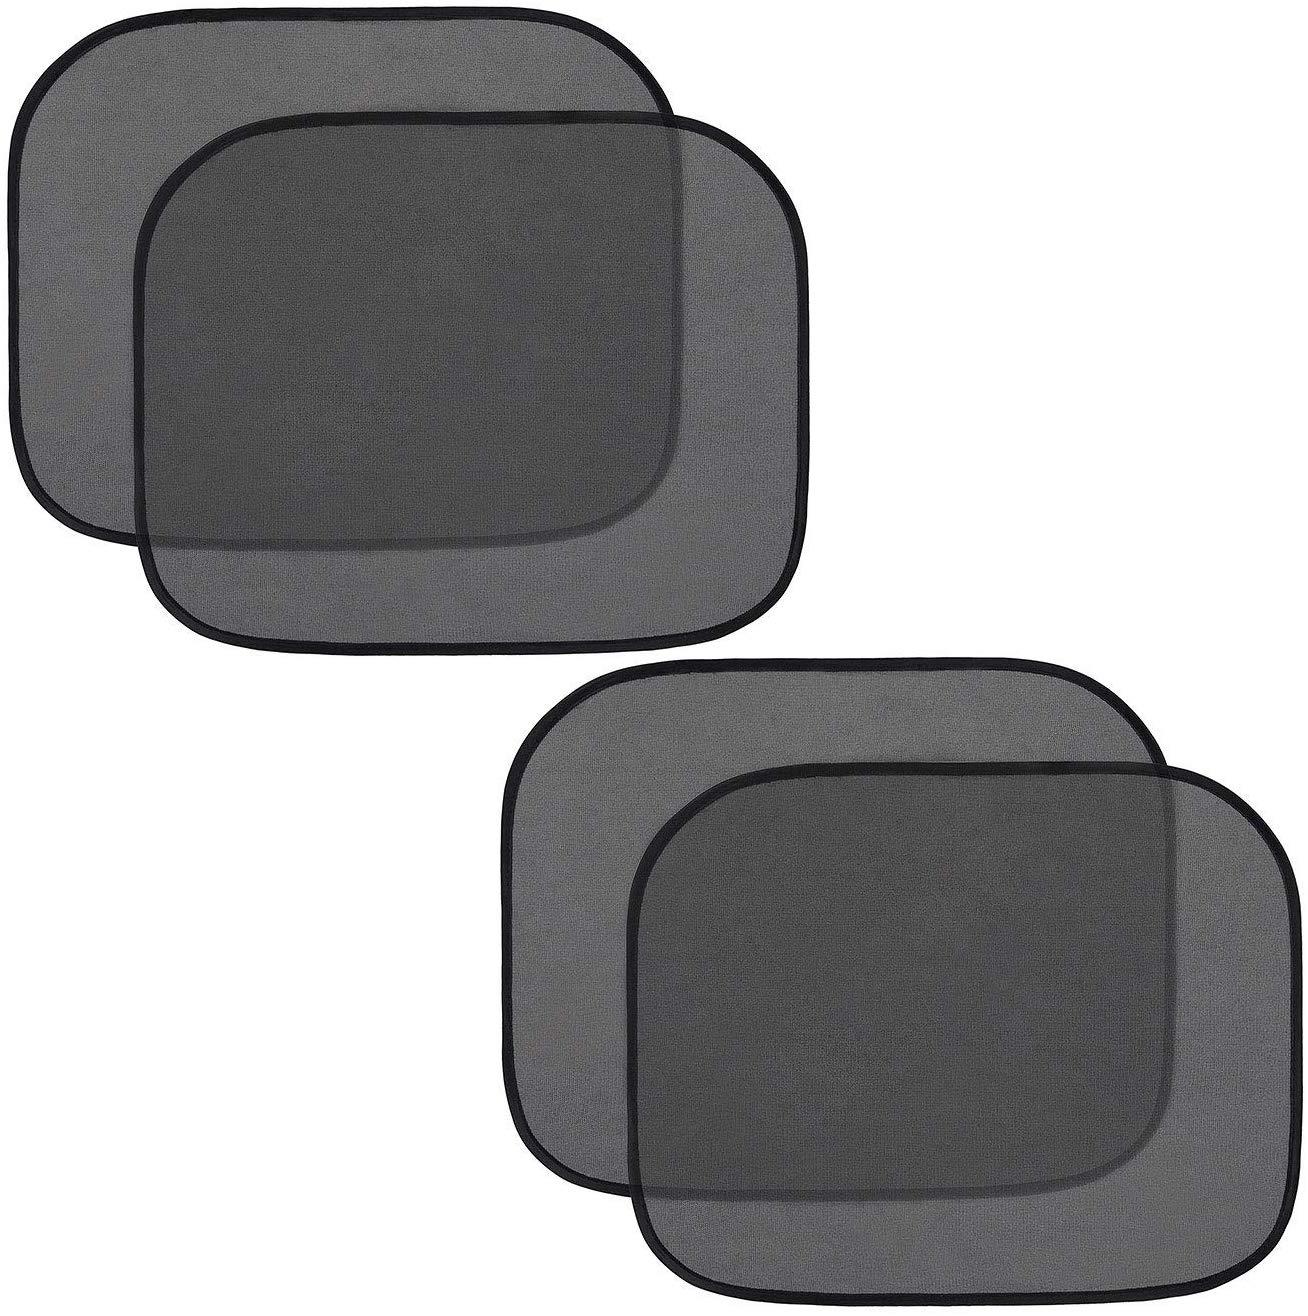 4pcs Car Window Shades 44*38cm Electrostatic Film Side Window Sunshade